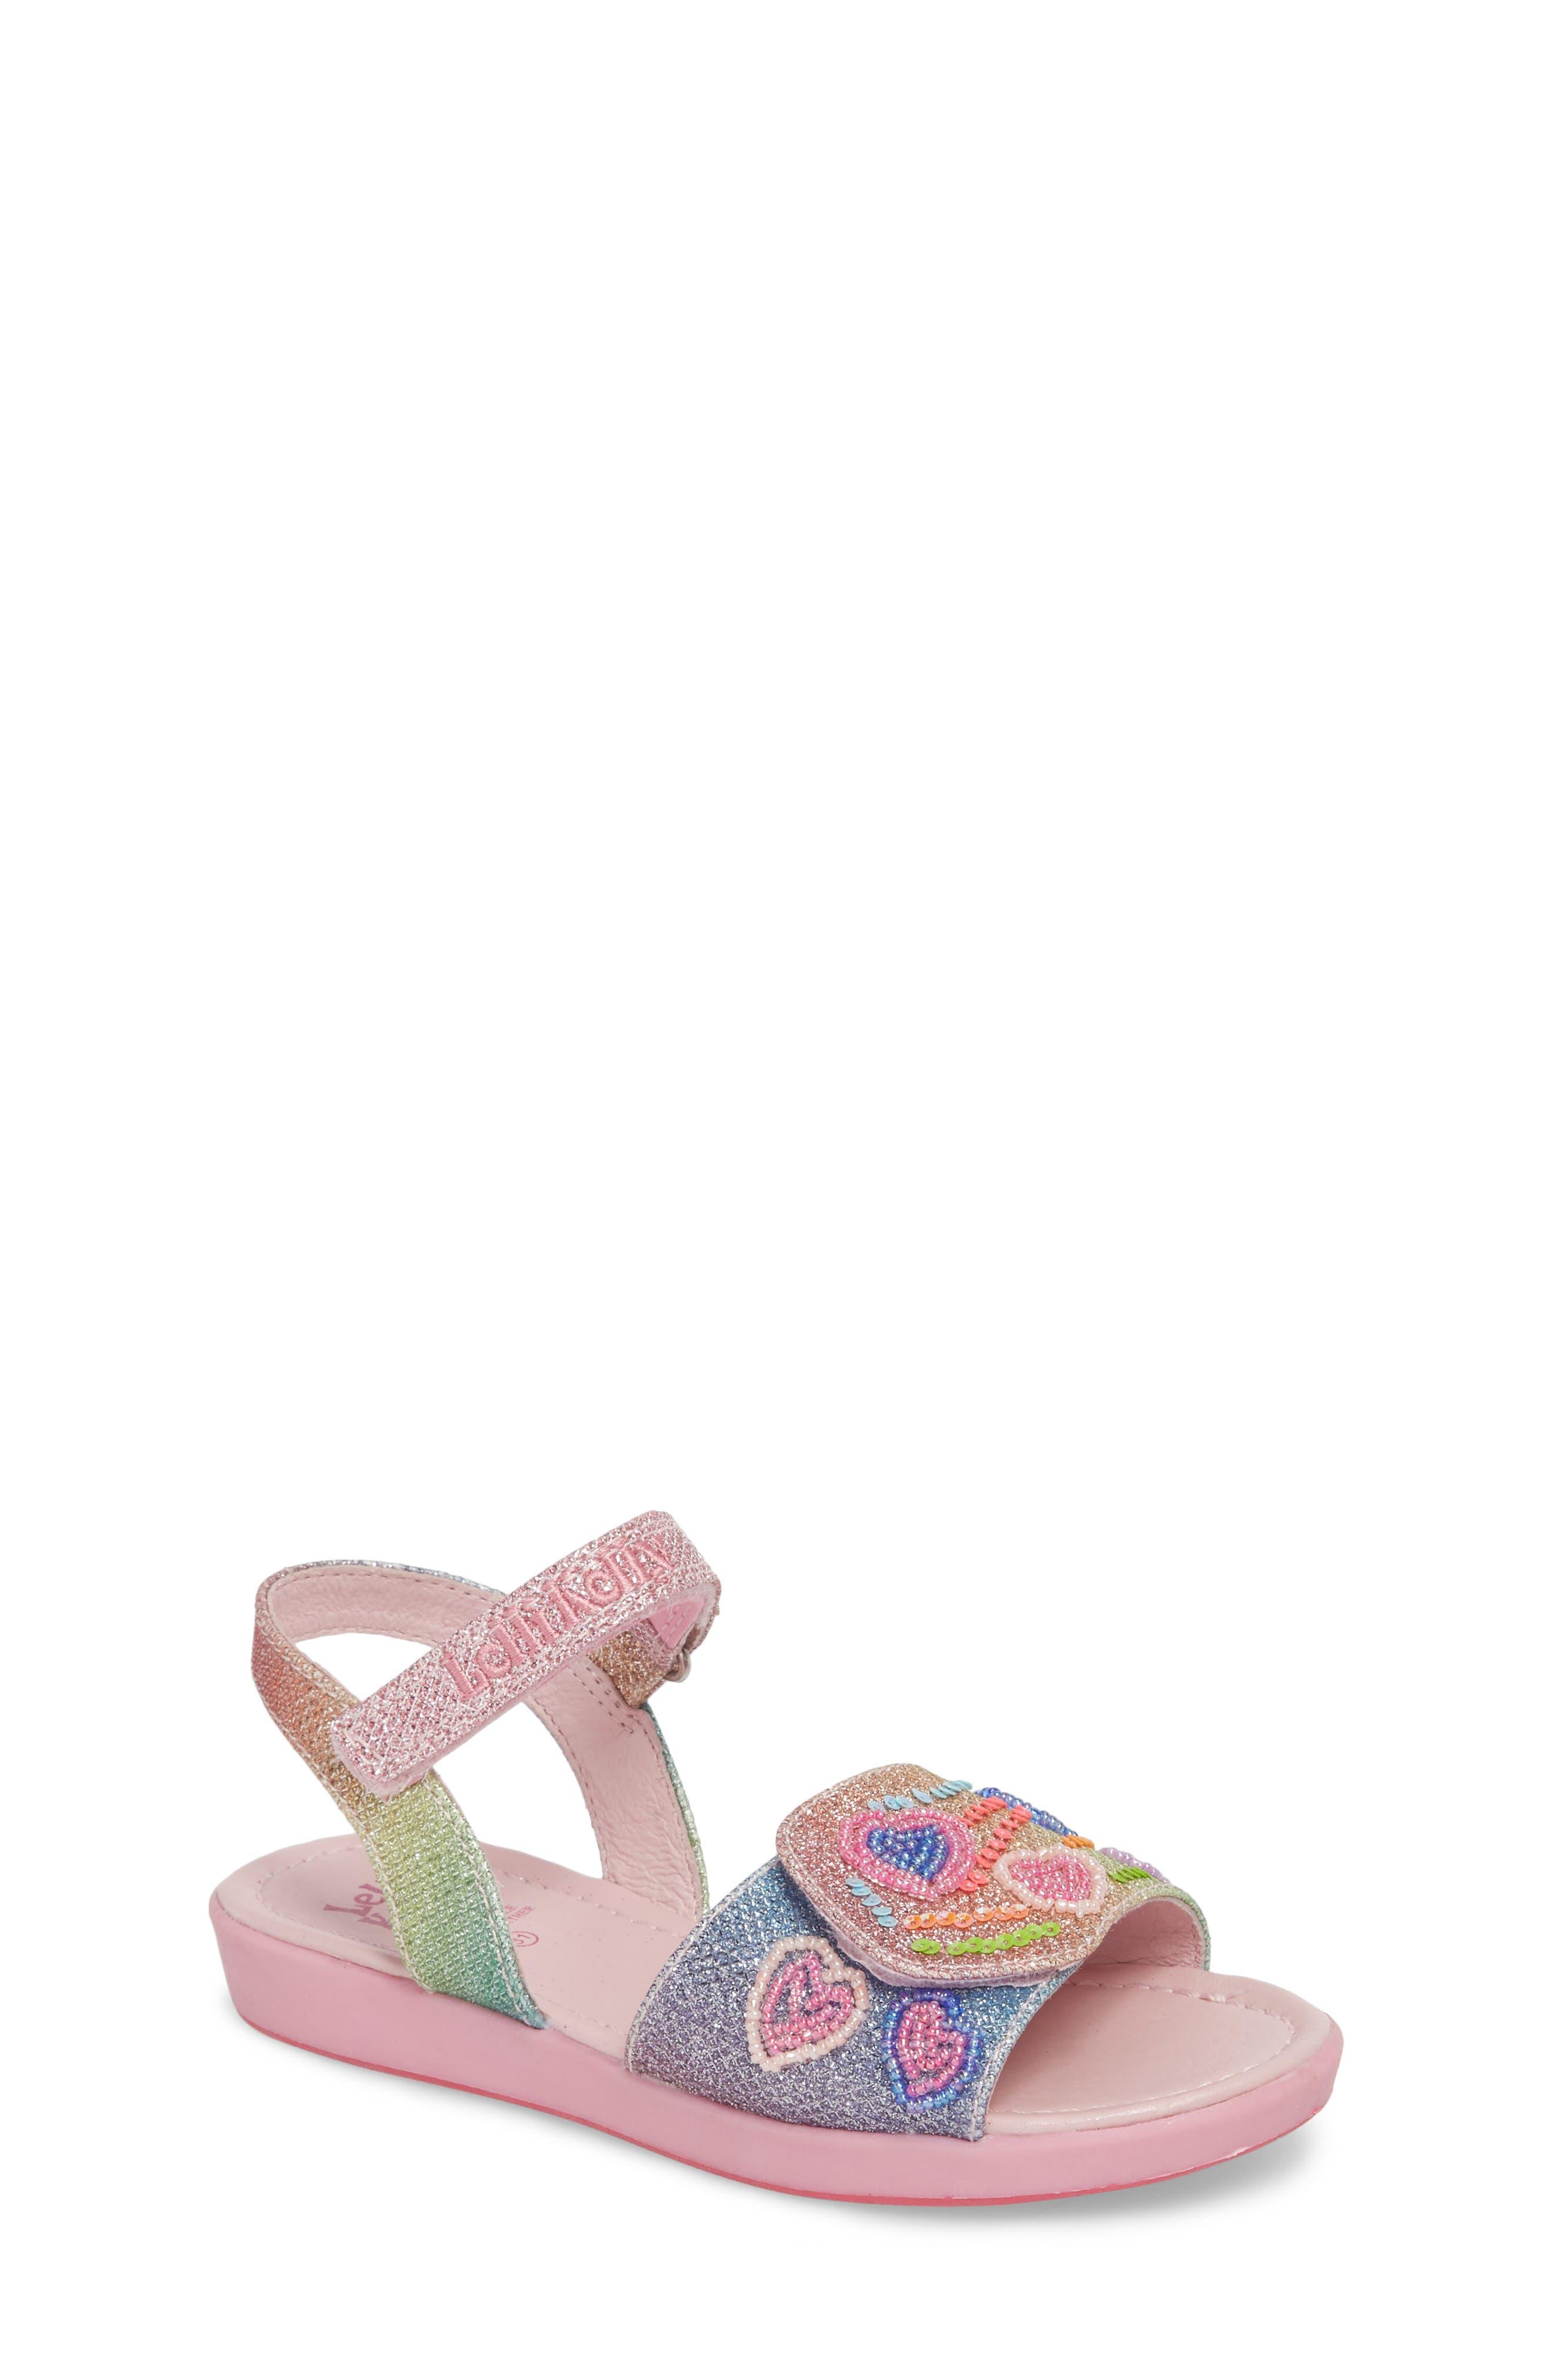 Beaded Sandal,                         Main,                         color, Blue